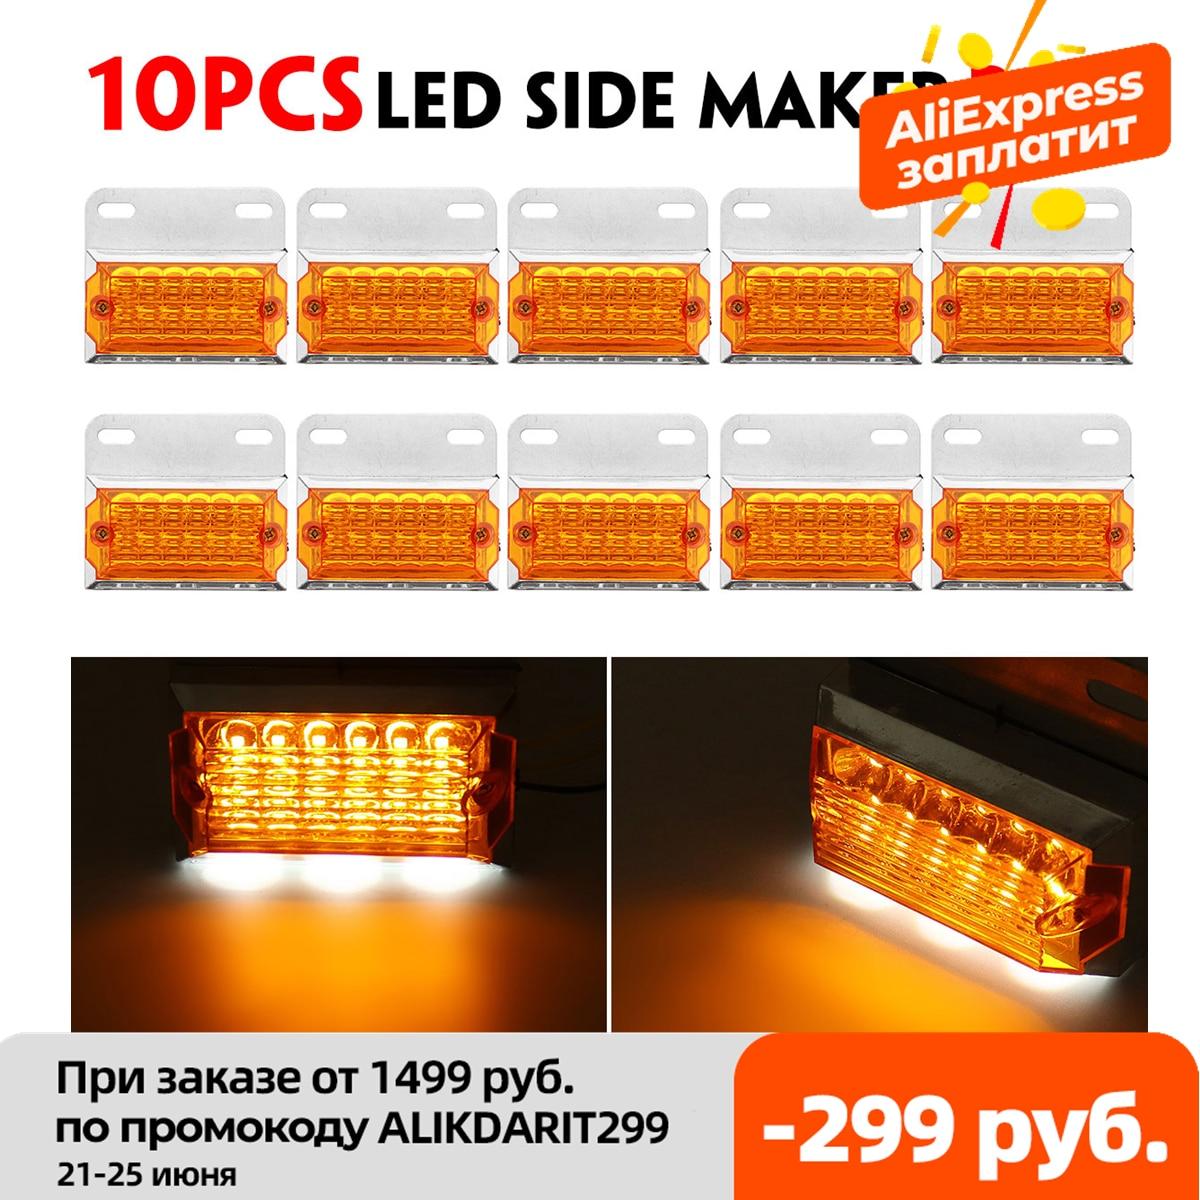 10pcs 24V 15 LED Side Marker Lights Car External Lights Squarde Warning Tail Light Signal Lamps Auto Trailer Truck Lorry Amber